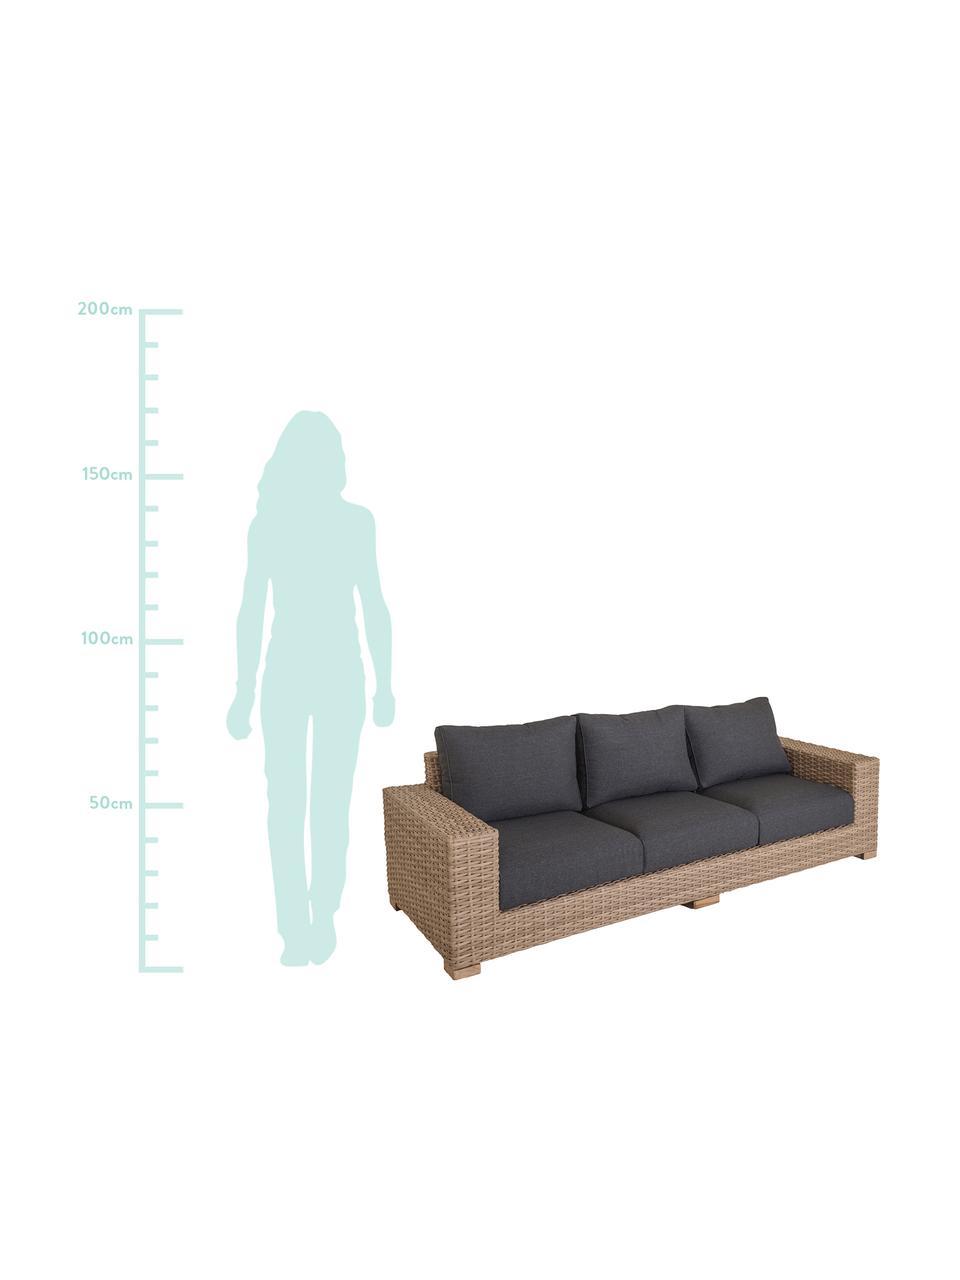 Outdoor zitbank Saba (3-zits), Frame: polyrotan, UV-bestendig, Poten: massief acaciahout, Frame: aluminium, Bekleding: polyester, UV-bestendig e, Bruin, 248 x 74 cm